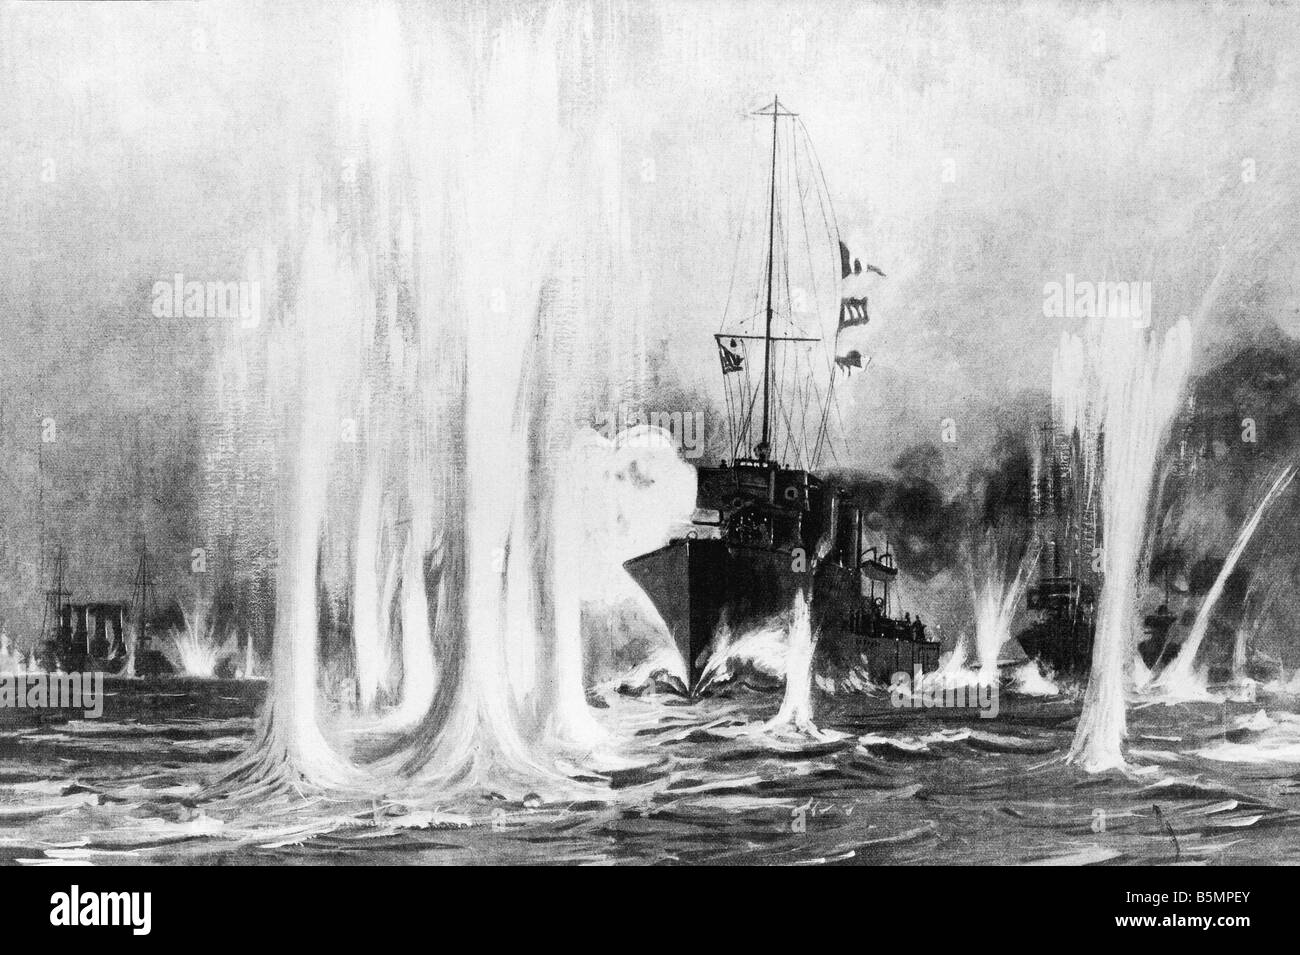 9 1914 8 28 A1 E Batalla Naval de agosto de 1914 la madera eng Guerra Mundial 1 guerra en el mar batalla naval en Helgoland 28 8 1914 con escenas de batalla Foto de stock